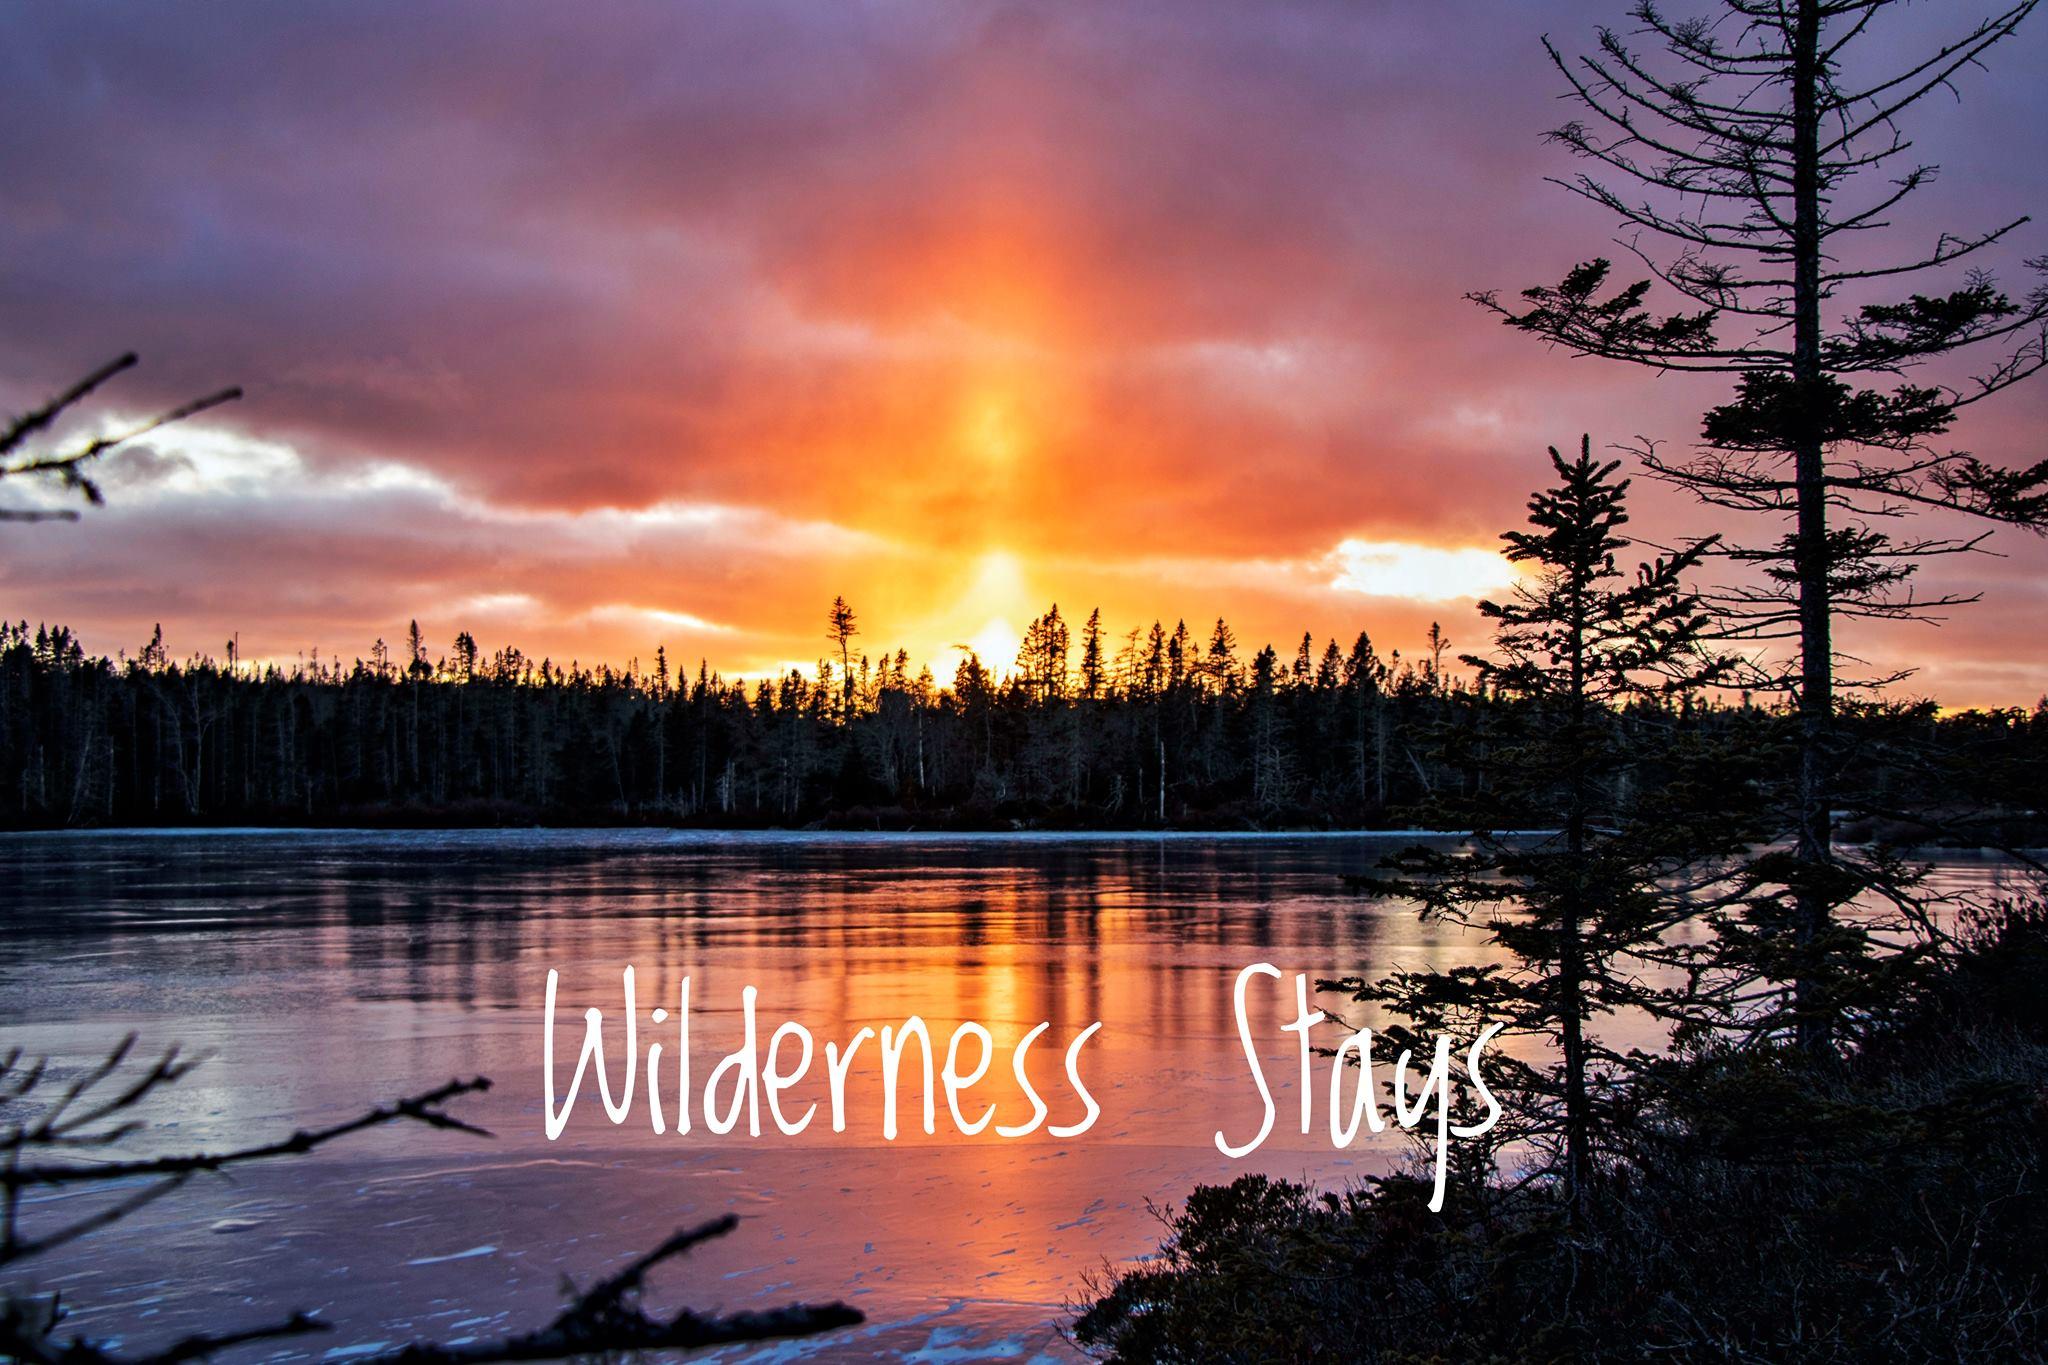 Wilderness Stays Limited Logo